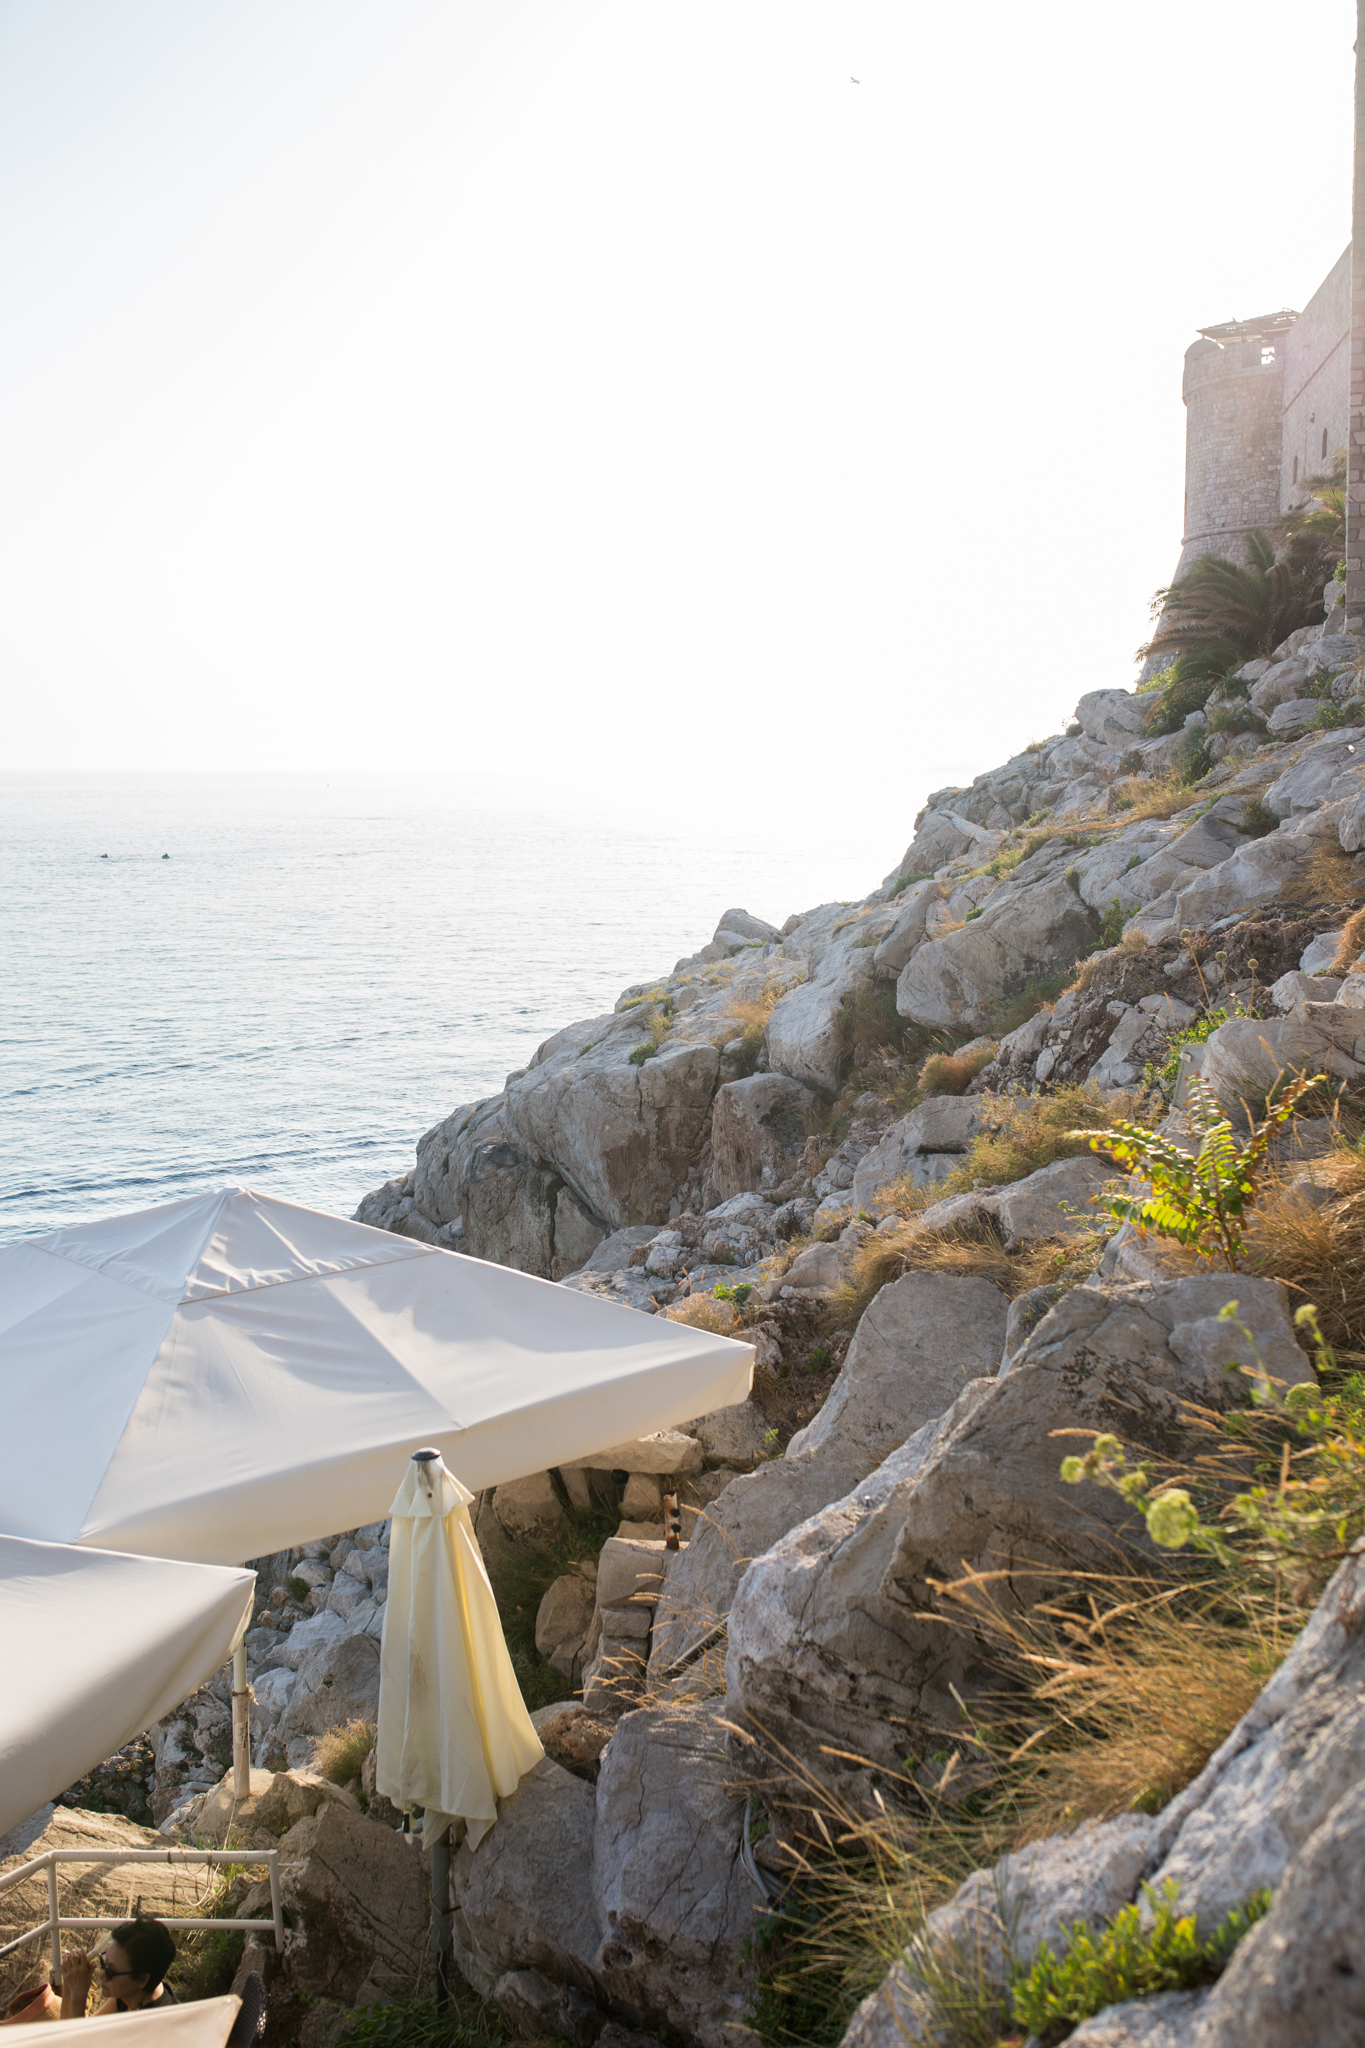 dubrovnik-croatia-dubrovnik hidden spots-dubrovnik beaches-cliff diving in dubrovnik-cliff diving in croatia-arose travels-alina mendoza-9639.jpg